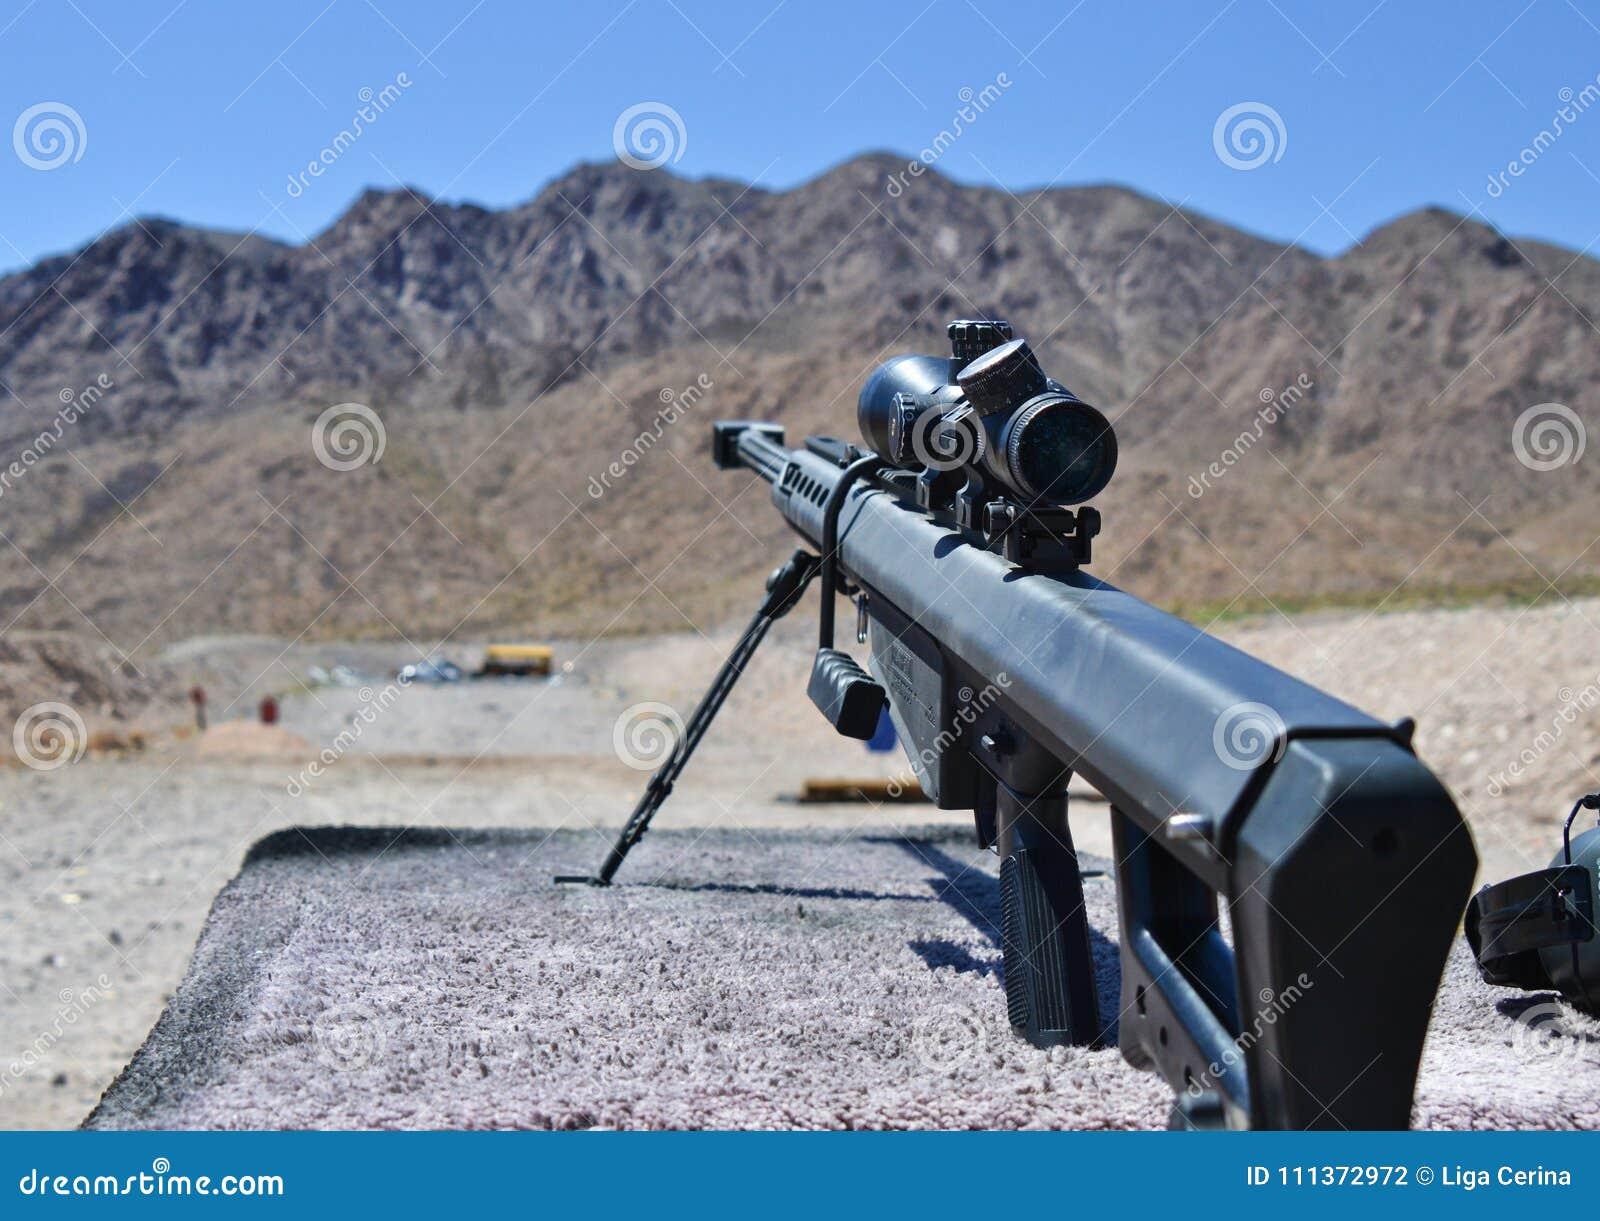 Sniper Barrett rifle , 0.50 caliber, m82a1